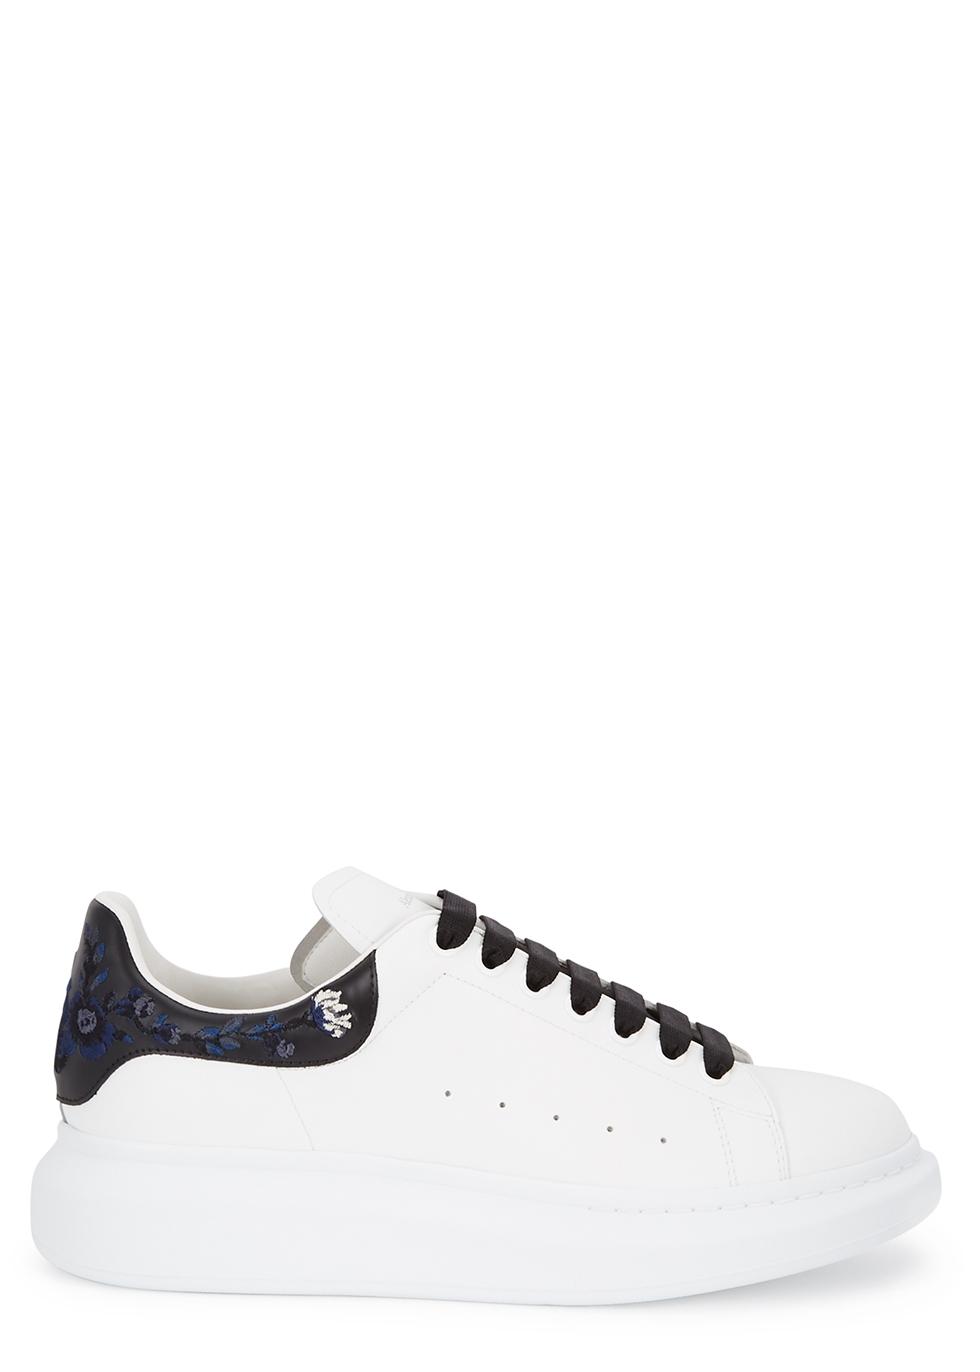 00edbffbc0a7 Alexander McQueen White knitted trainers - Harvey Nichols